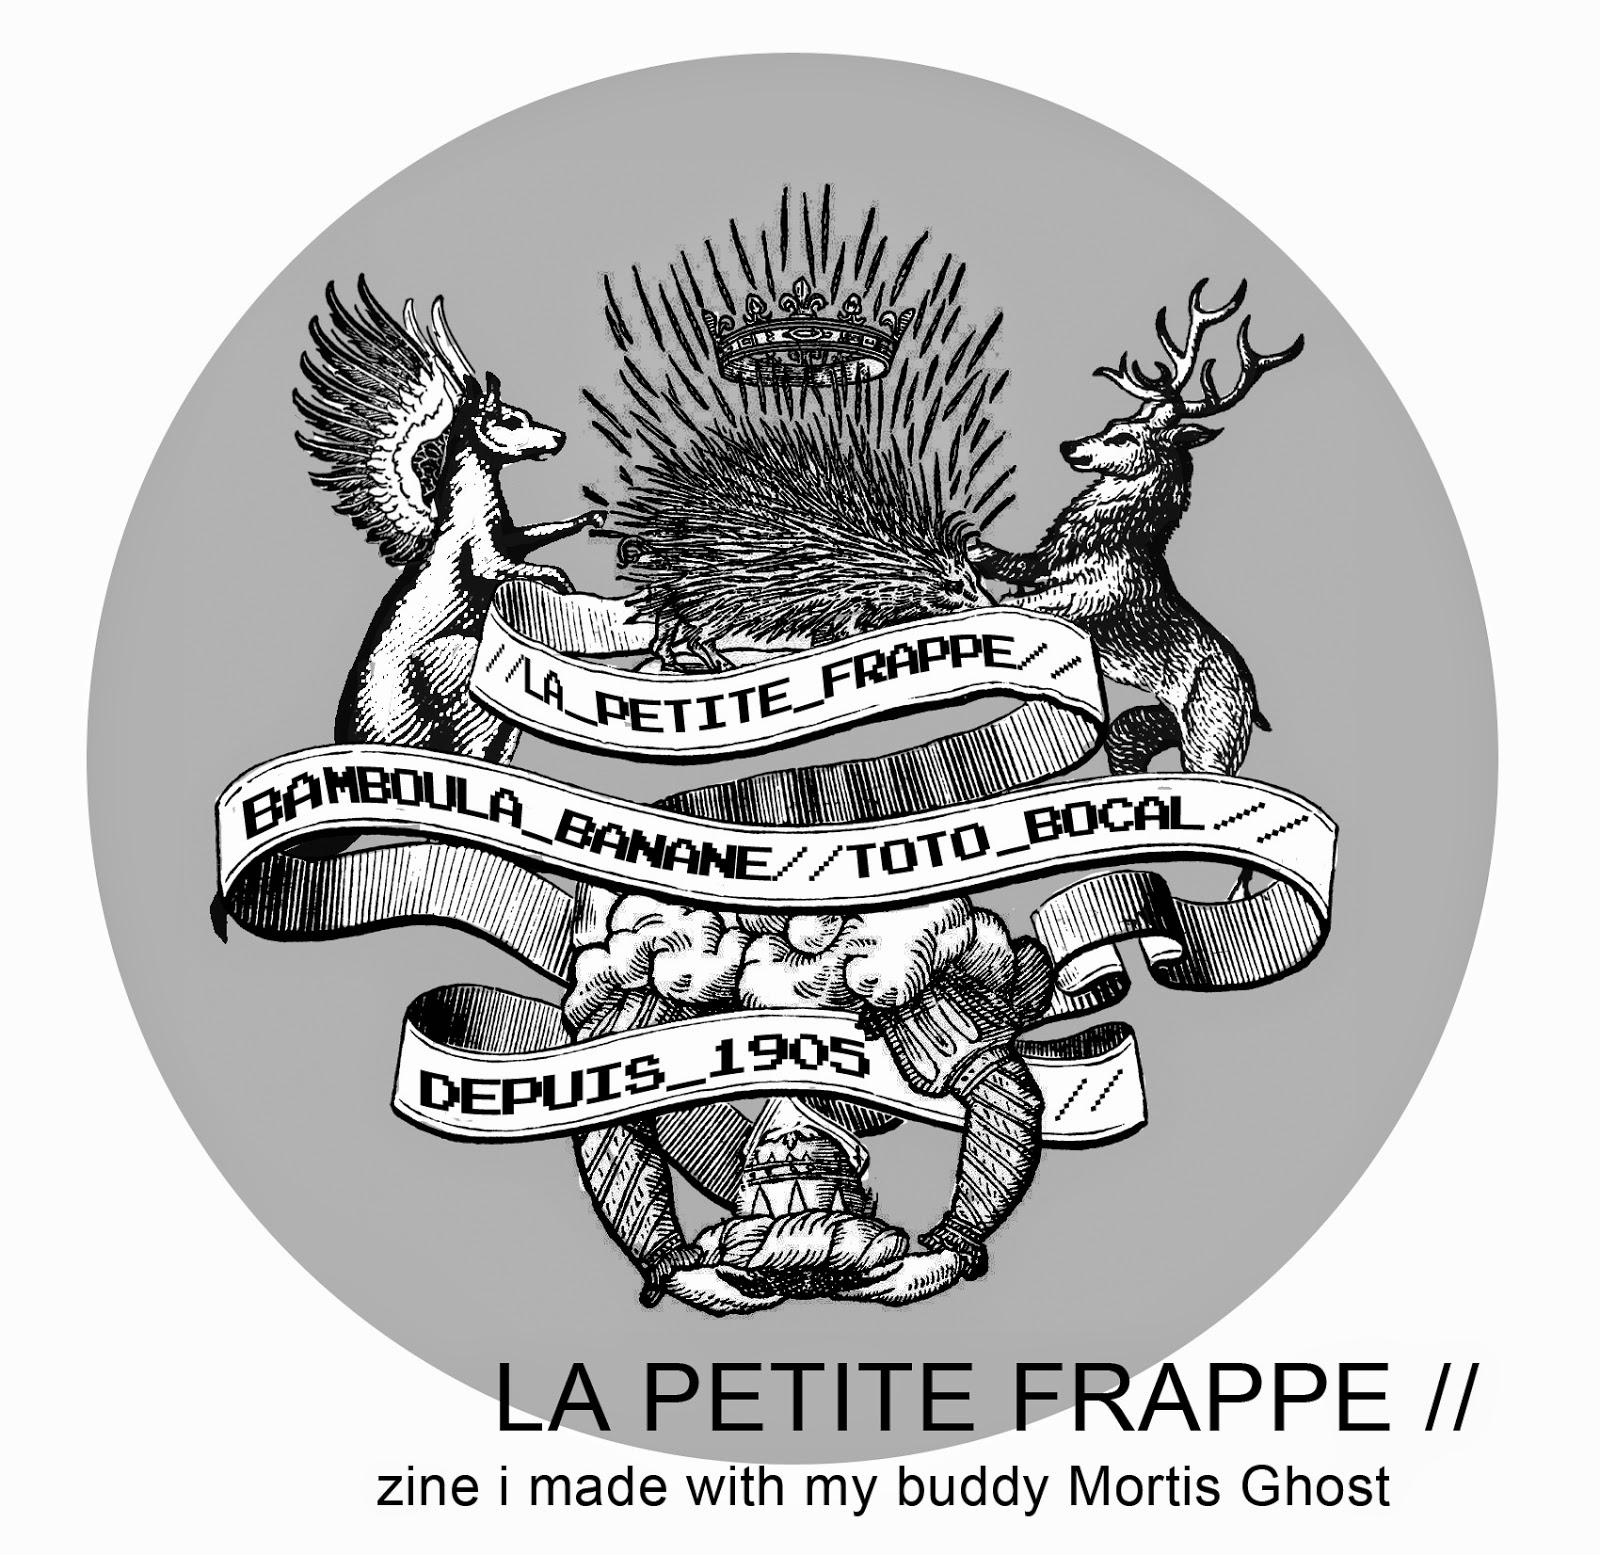 http://lapetitefrappe.blogspot.be/